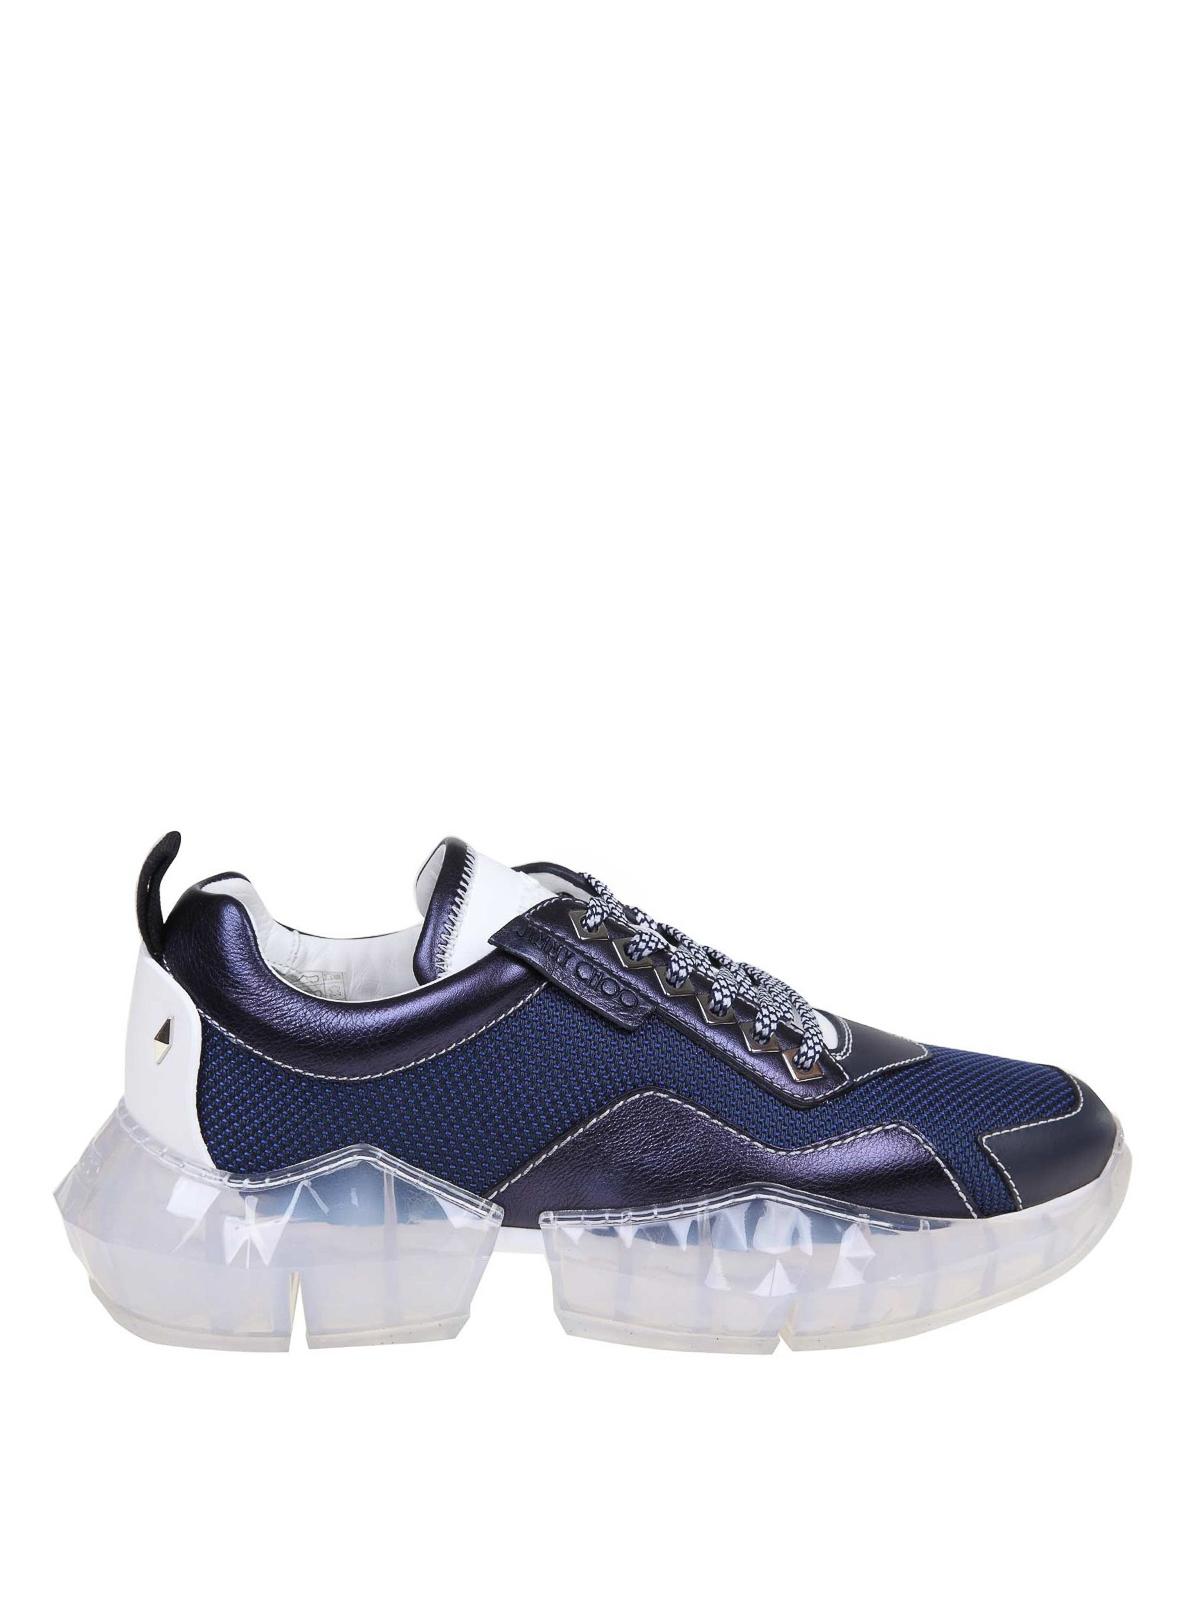 Jimmy Choo - Diamond blue sneakers